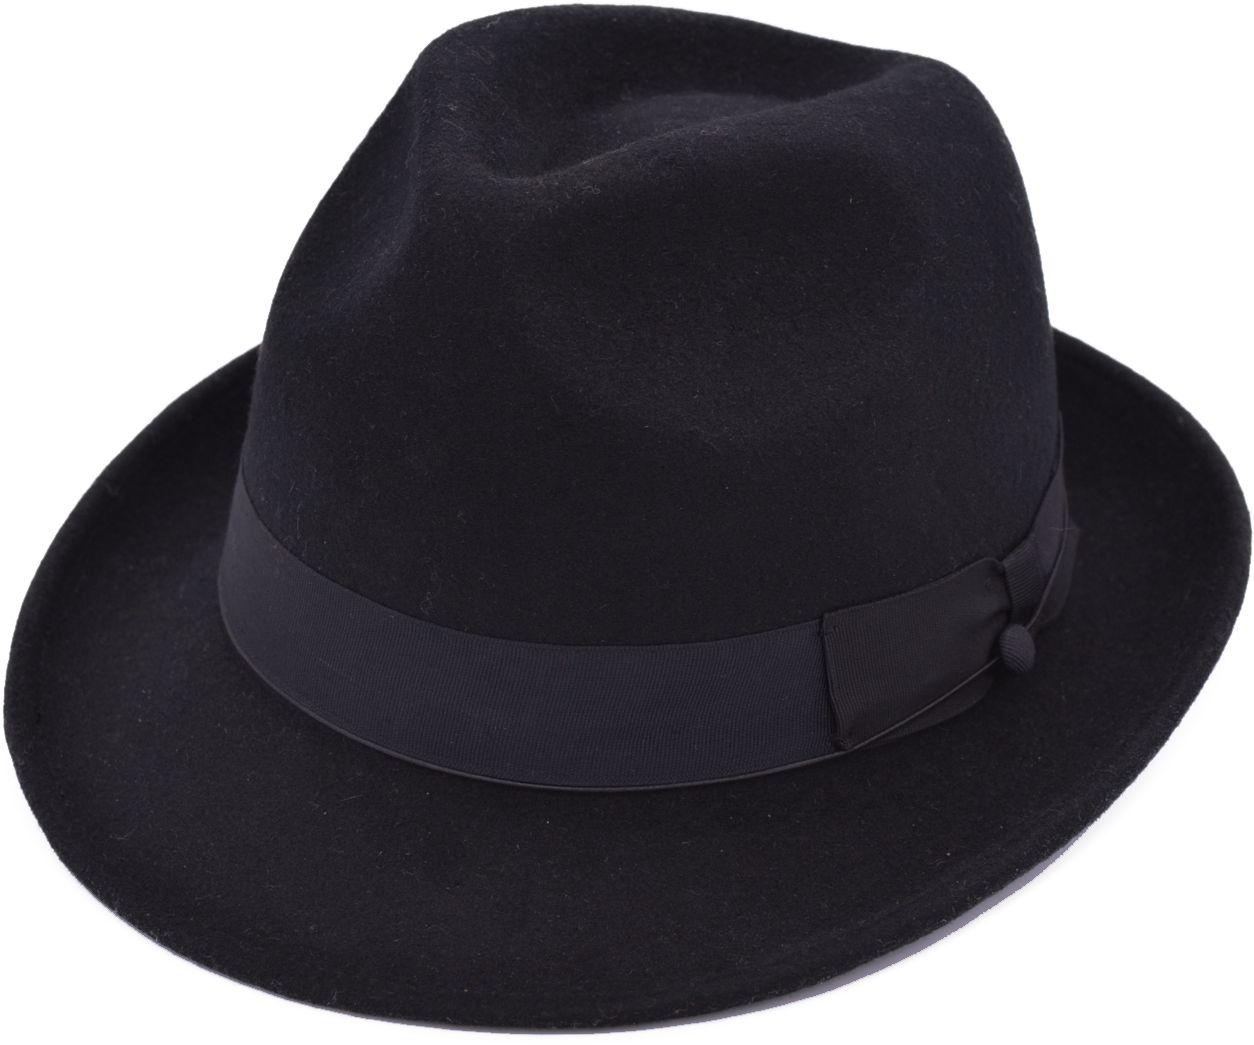 eae2701b_chapeau-retro-pin-up-40-s-50-s-rockabilly-trilby-noir